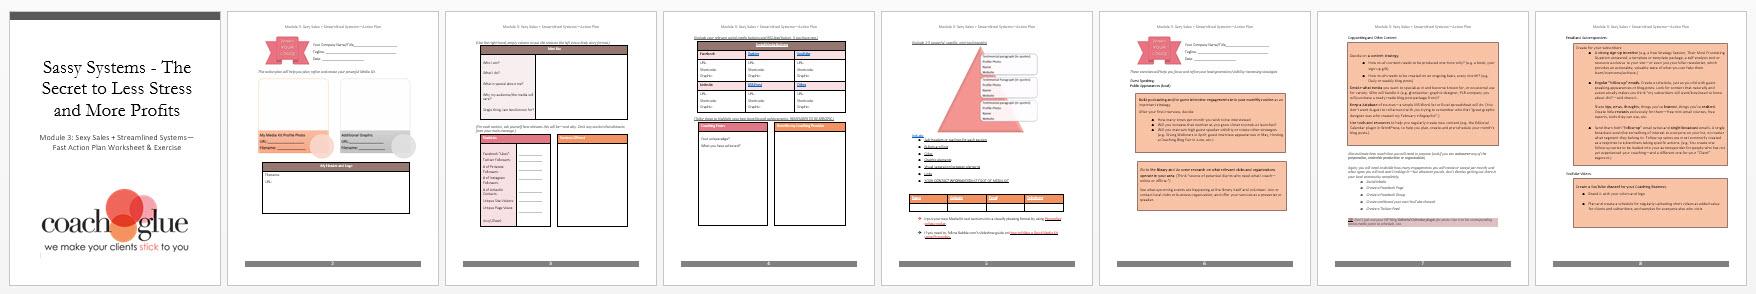 Module 3 Sexy Sales + Streamline Systems Action Plan Screenshot